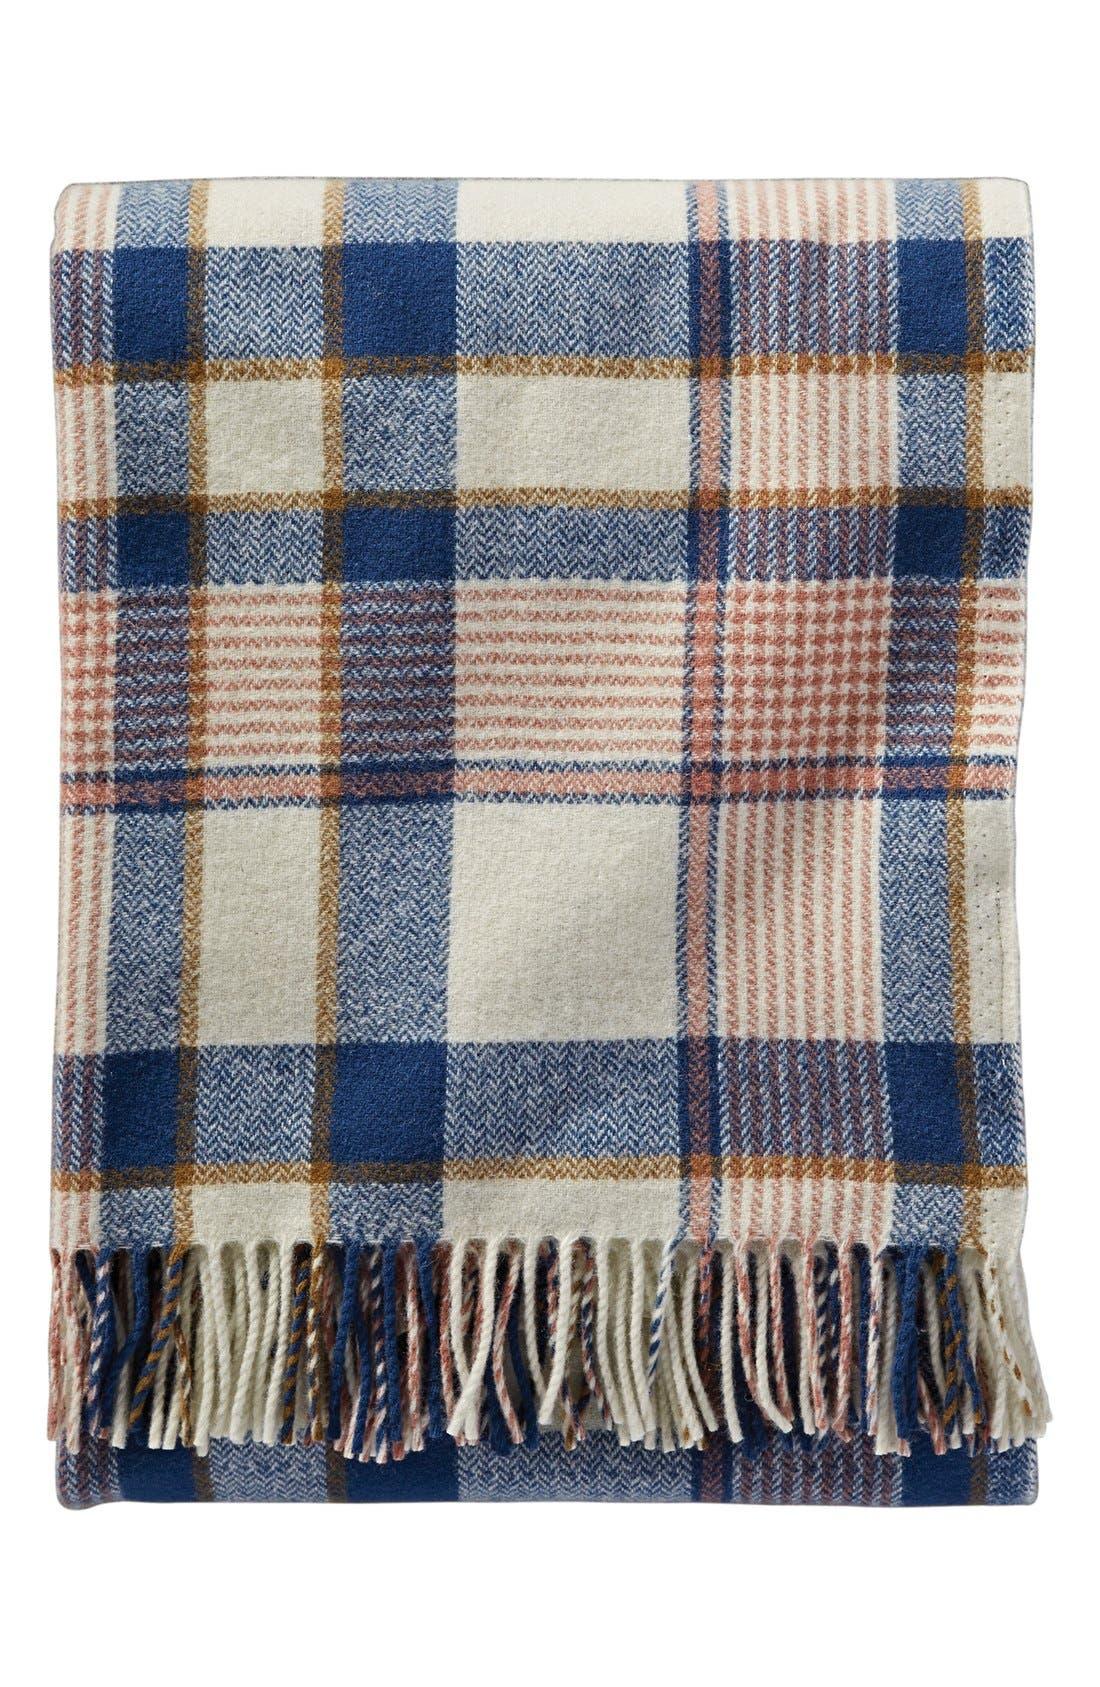 Alternate Image 1 Selected - Pendleton 'Hampshire Plaid' Throw Blanket & Carrier